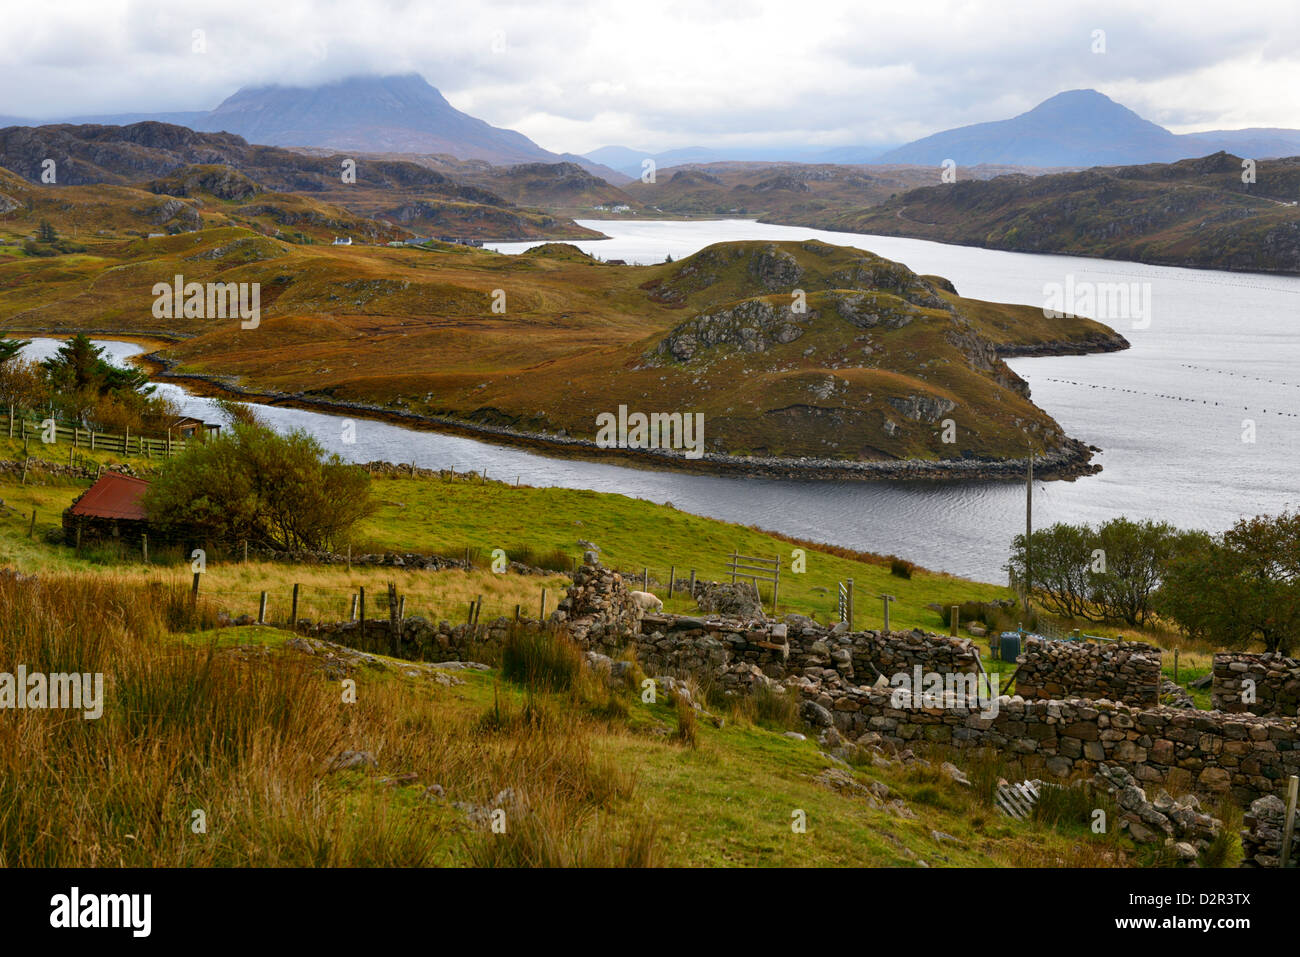 Rugged landscape, North West Highlands, Scotland, United Kingdom, Europe - Stock Image